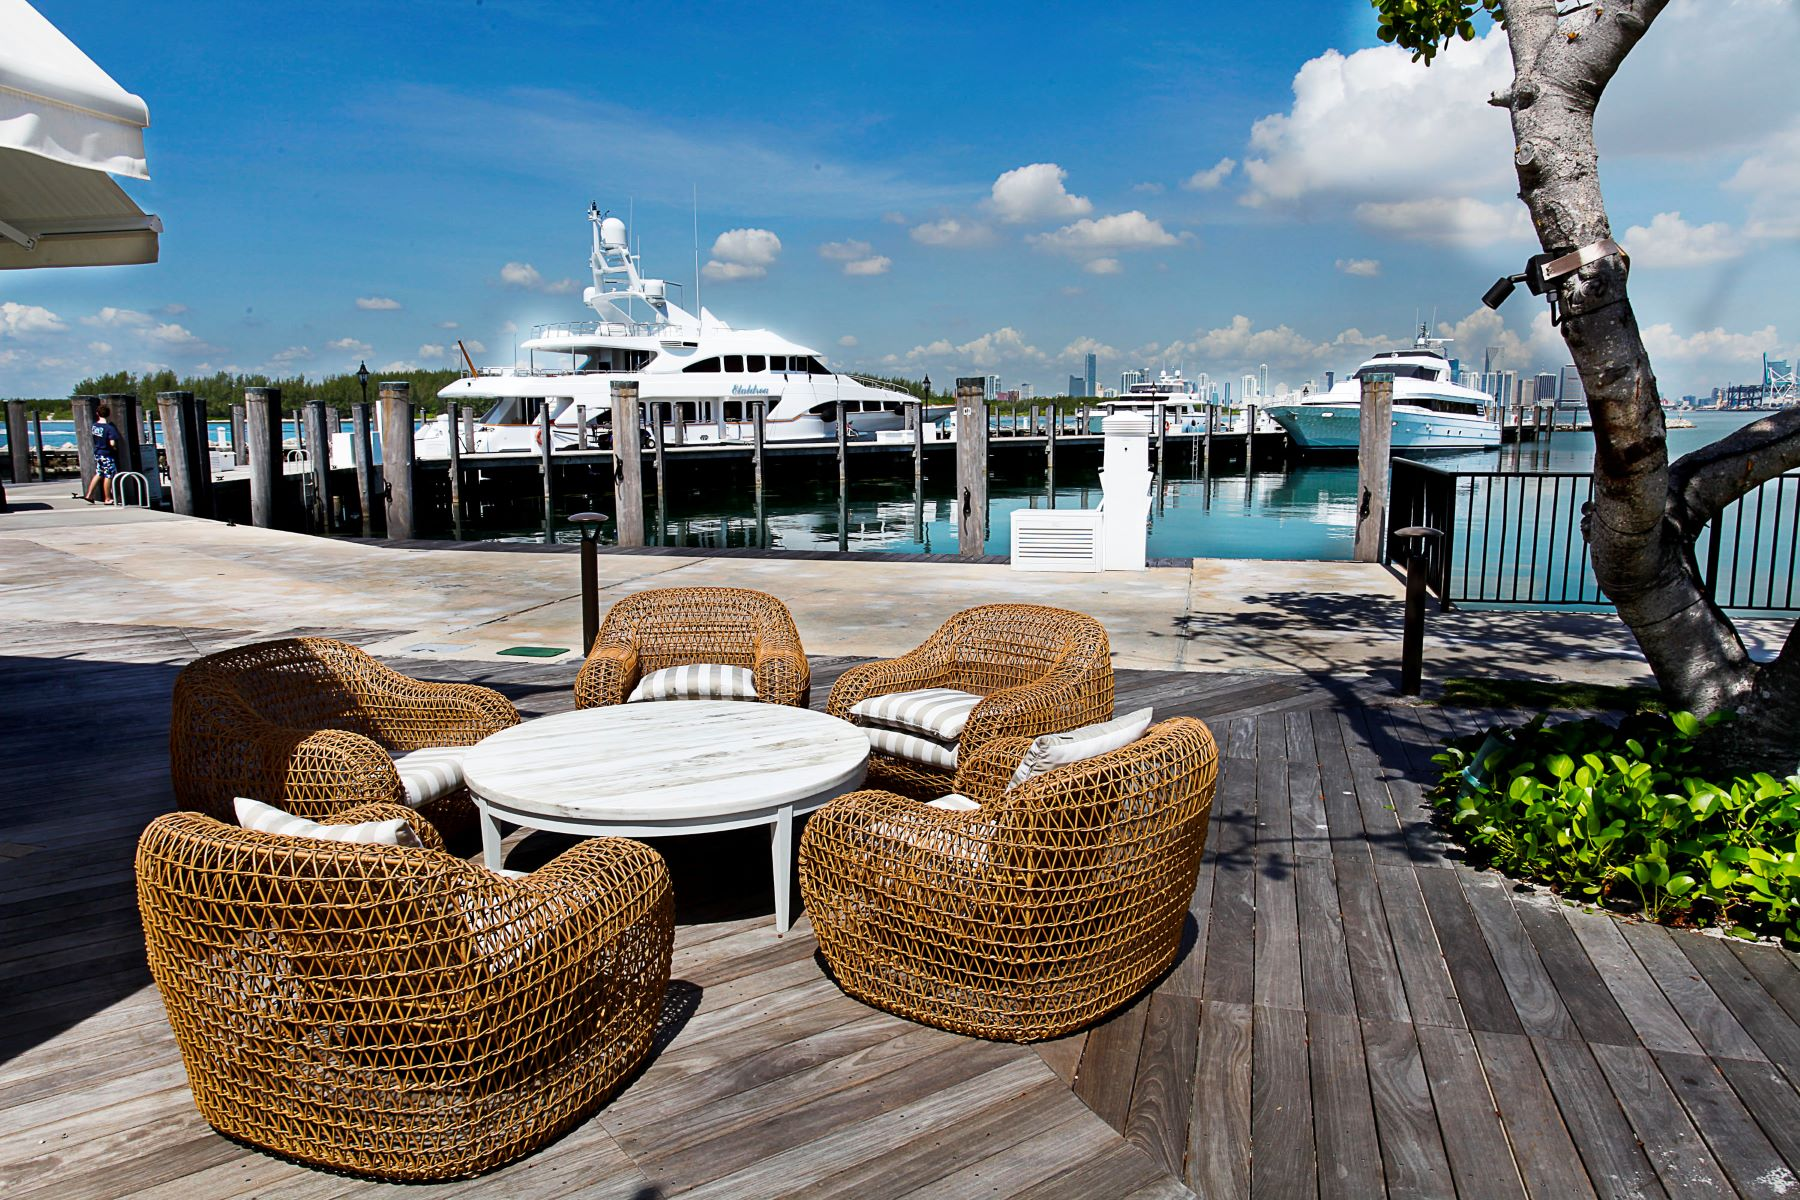 Imóvel para venda Miami Beach